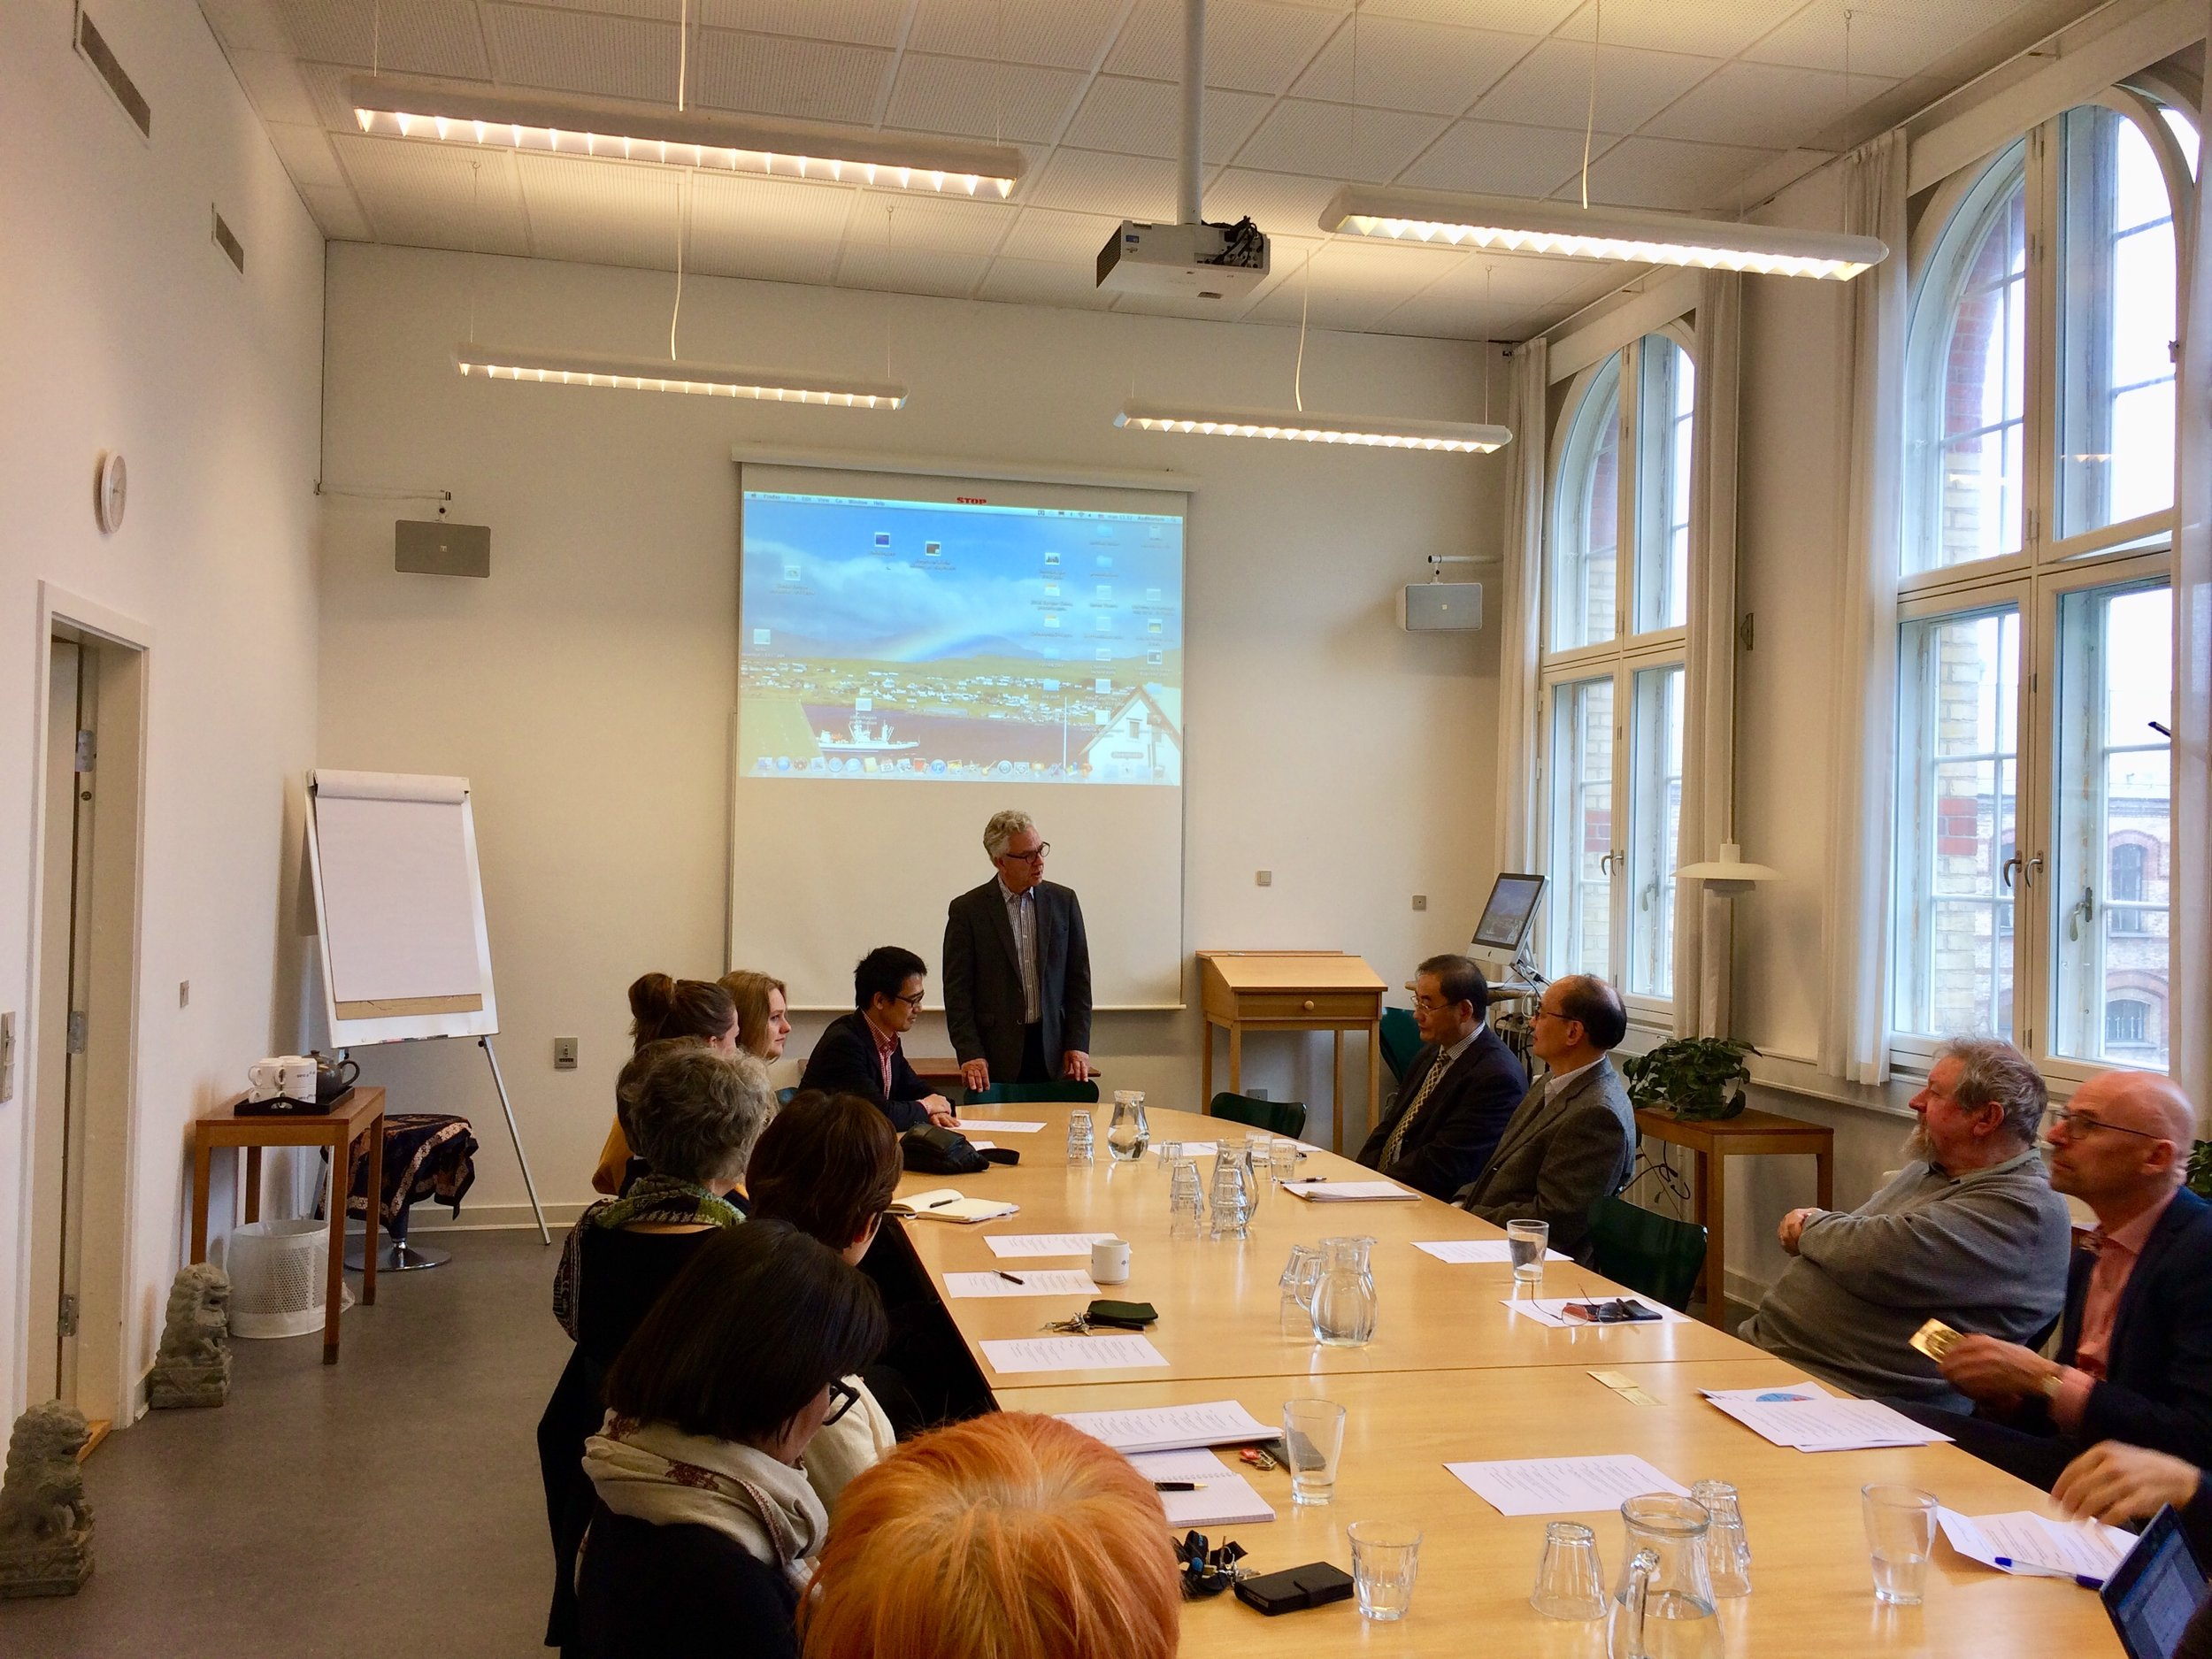 Geir Helgesen, Director of Nordic Institute of Asian Studies, opening the seminar